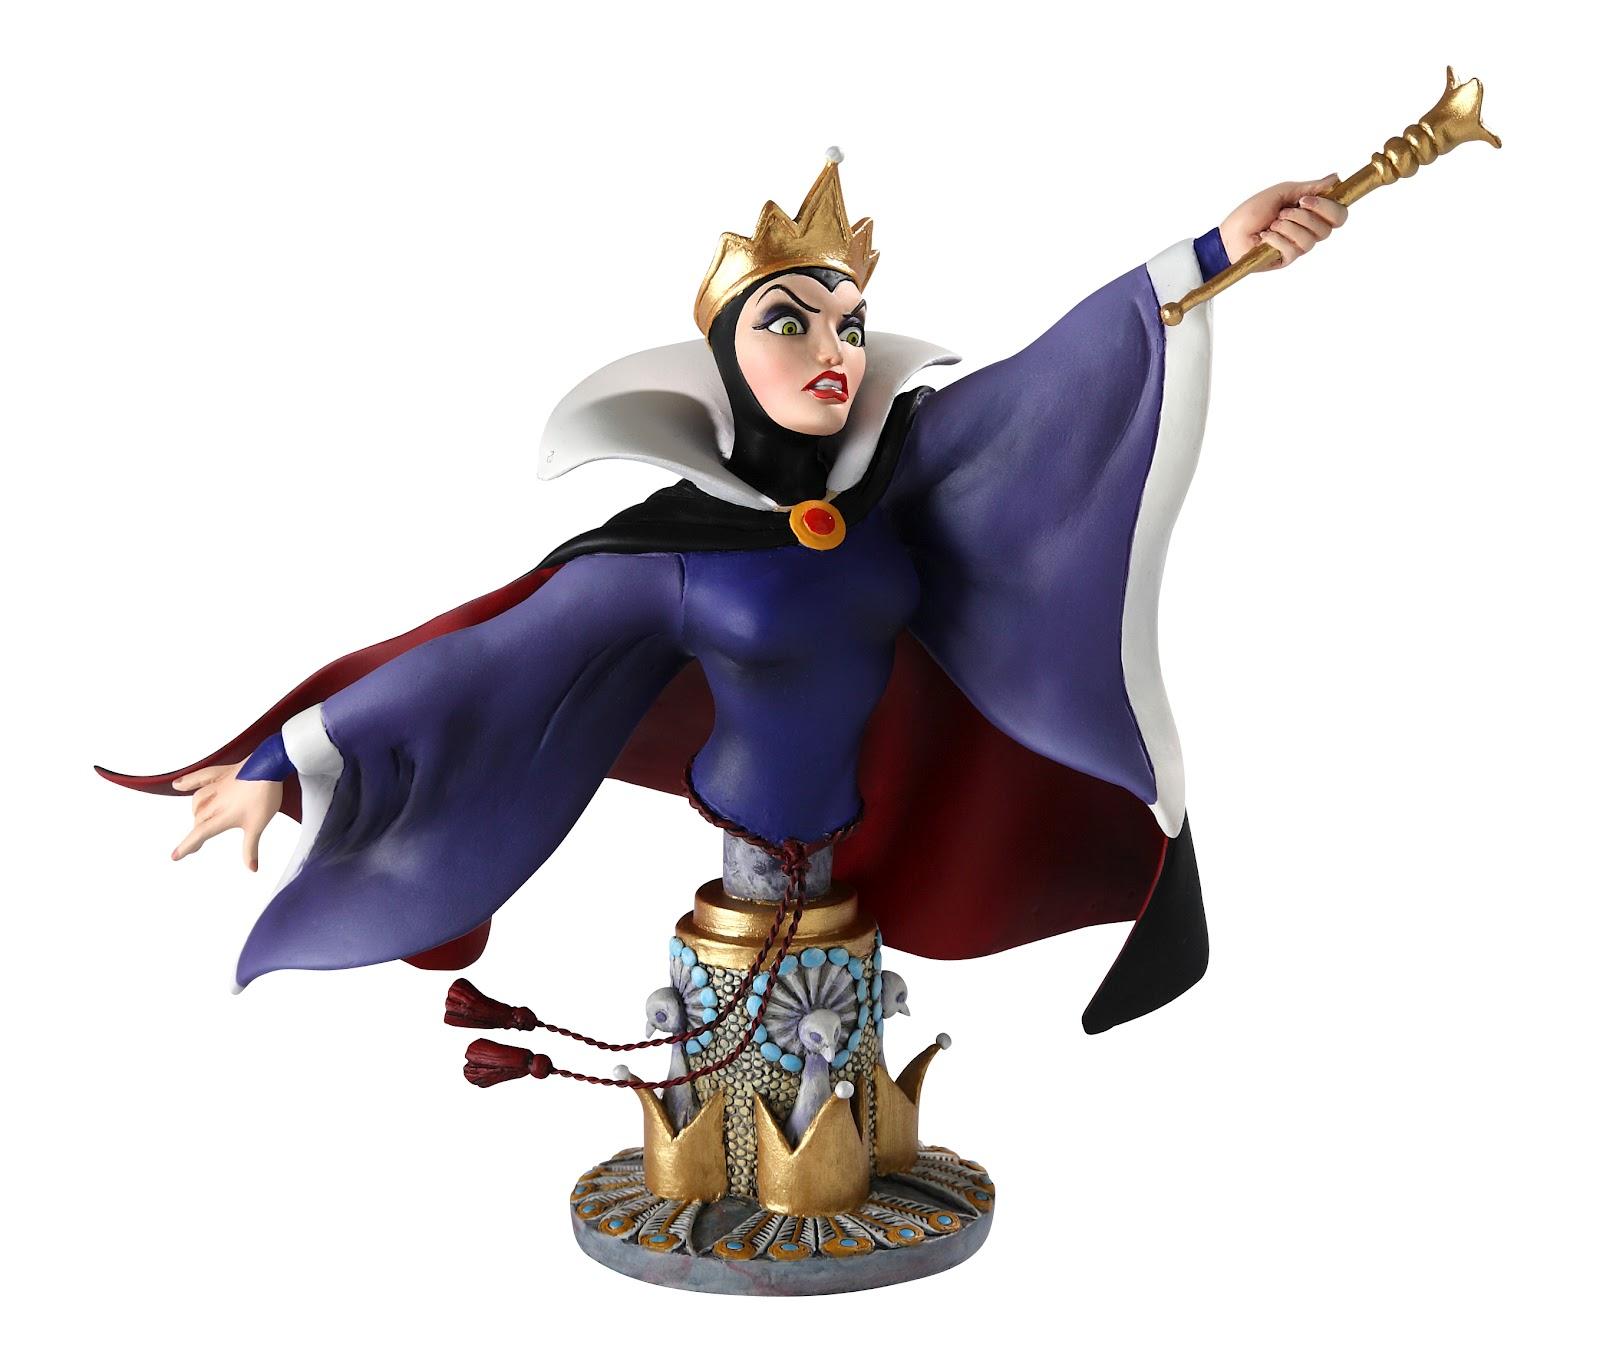 Patrick 39 s artist blog june 2012 - Evil queen disney ...